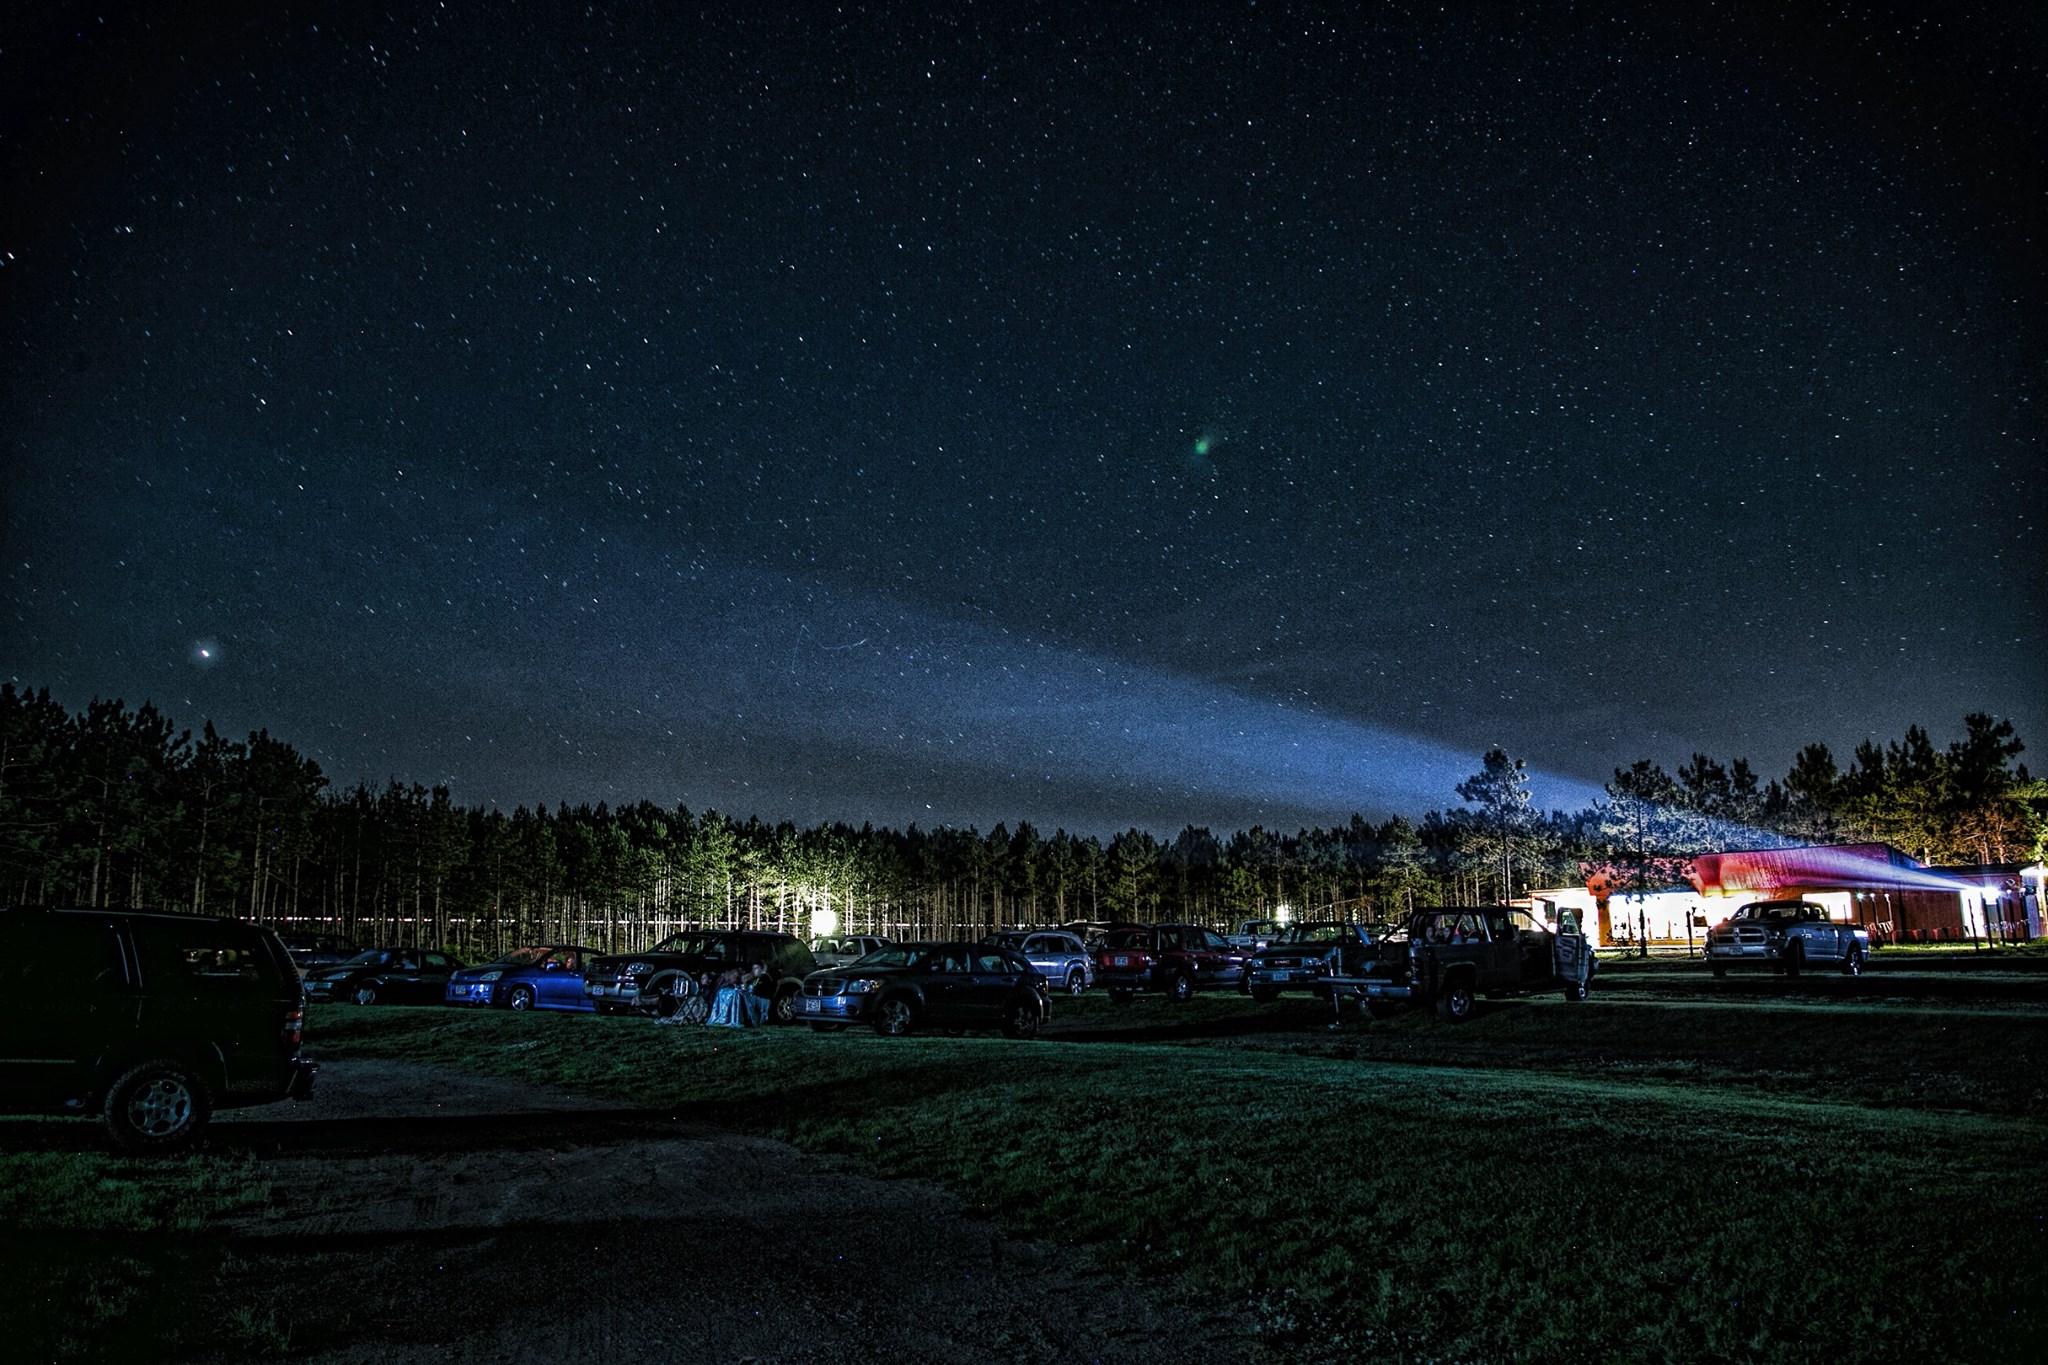 stardust3.jpg